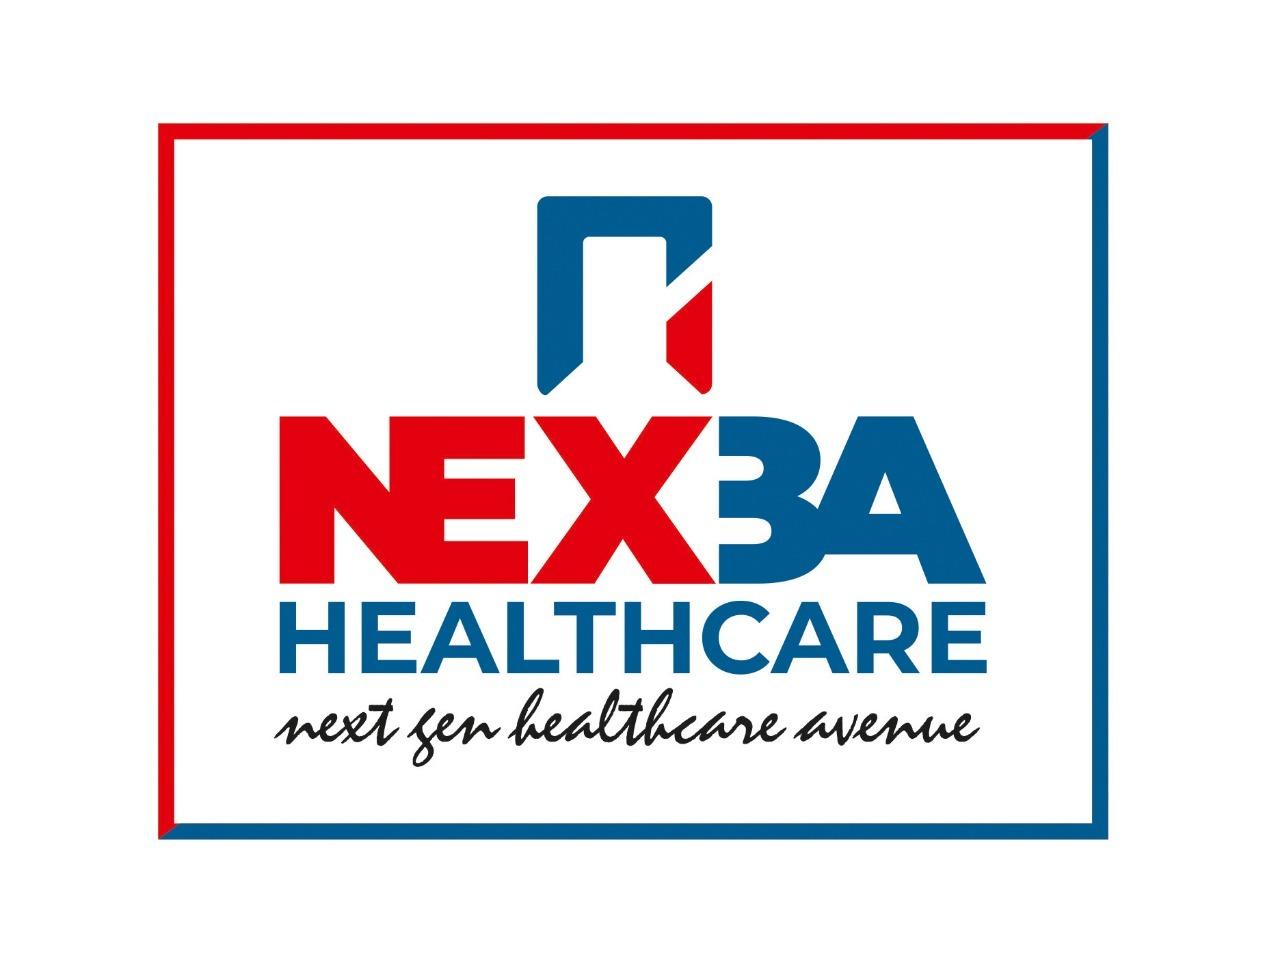 NEXBA HEALTHCARE MARKETING AND SERVICES PVT LTD